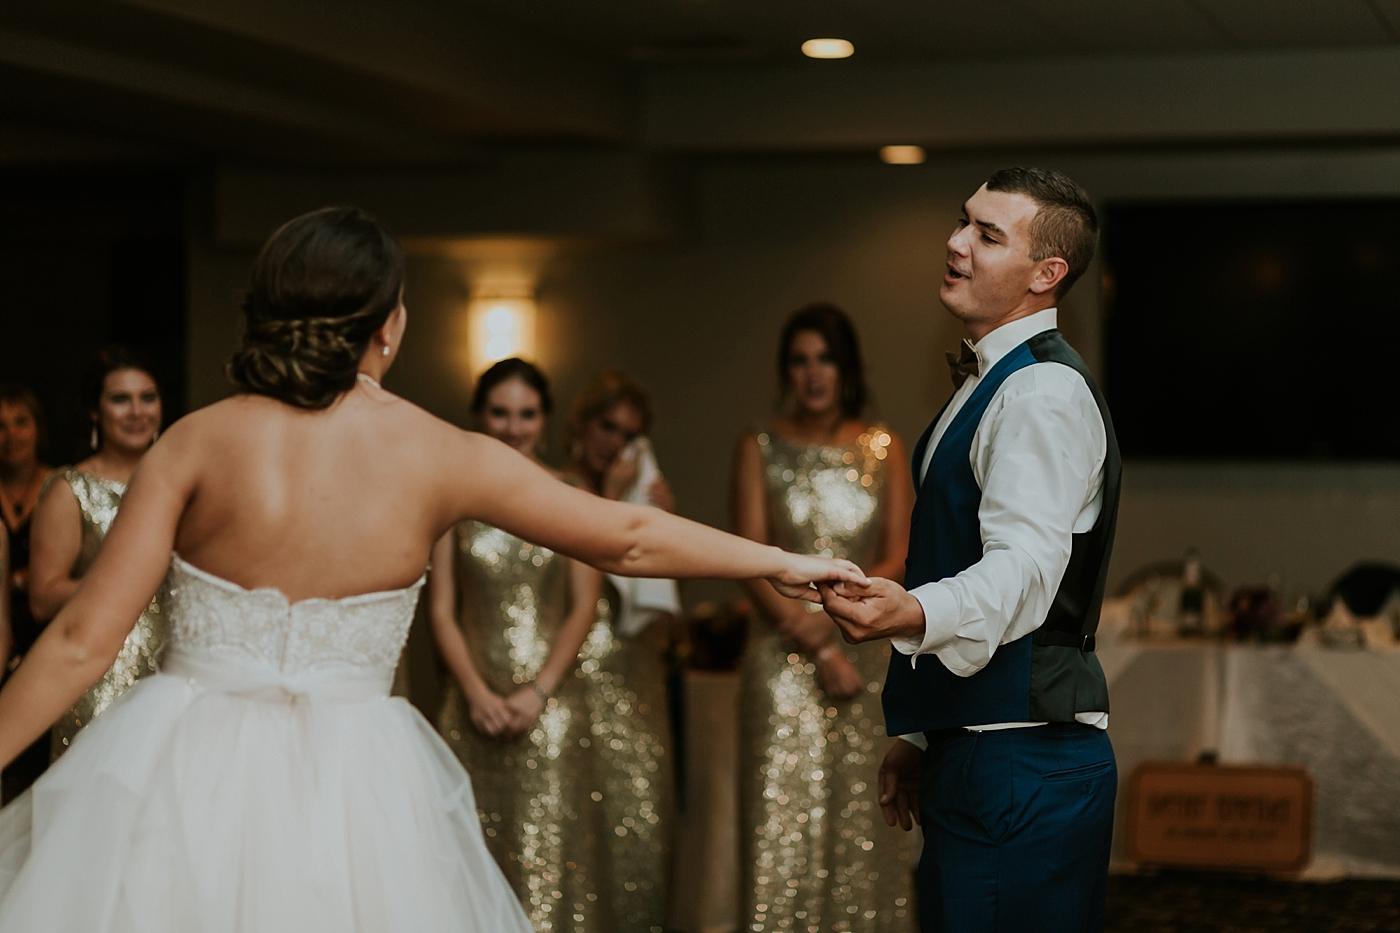 Ohio-Wedding_Kathryn+Devin_MJPHOTO2017-903.jpg